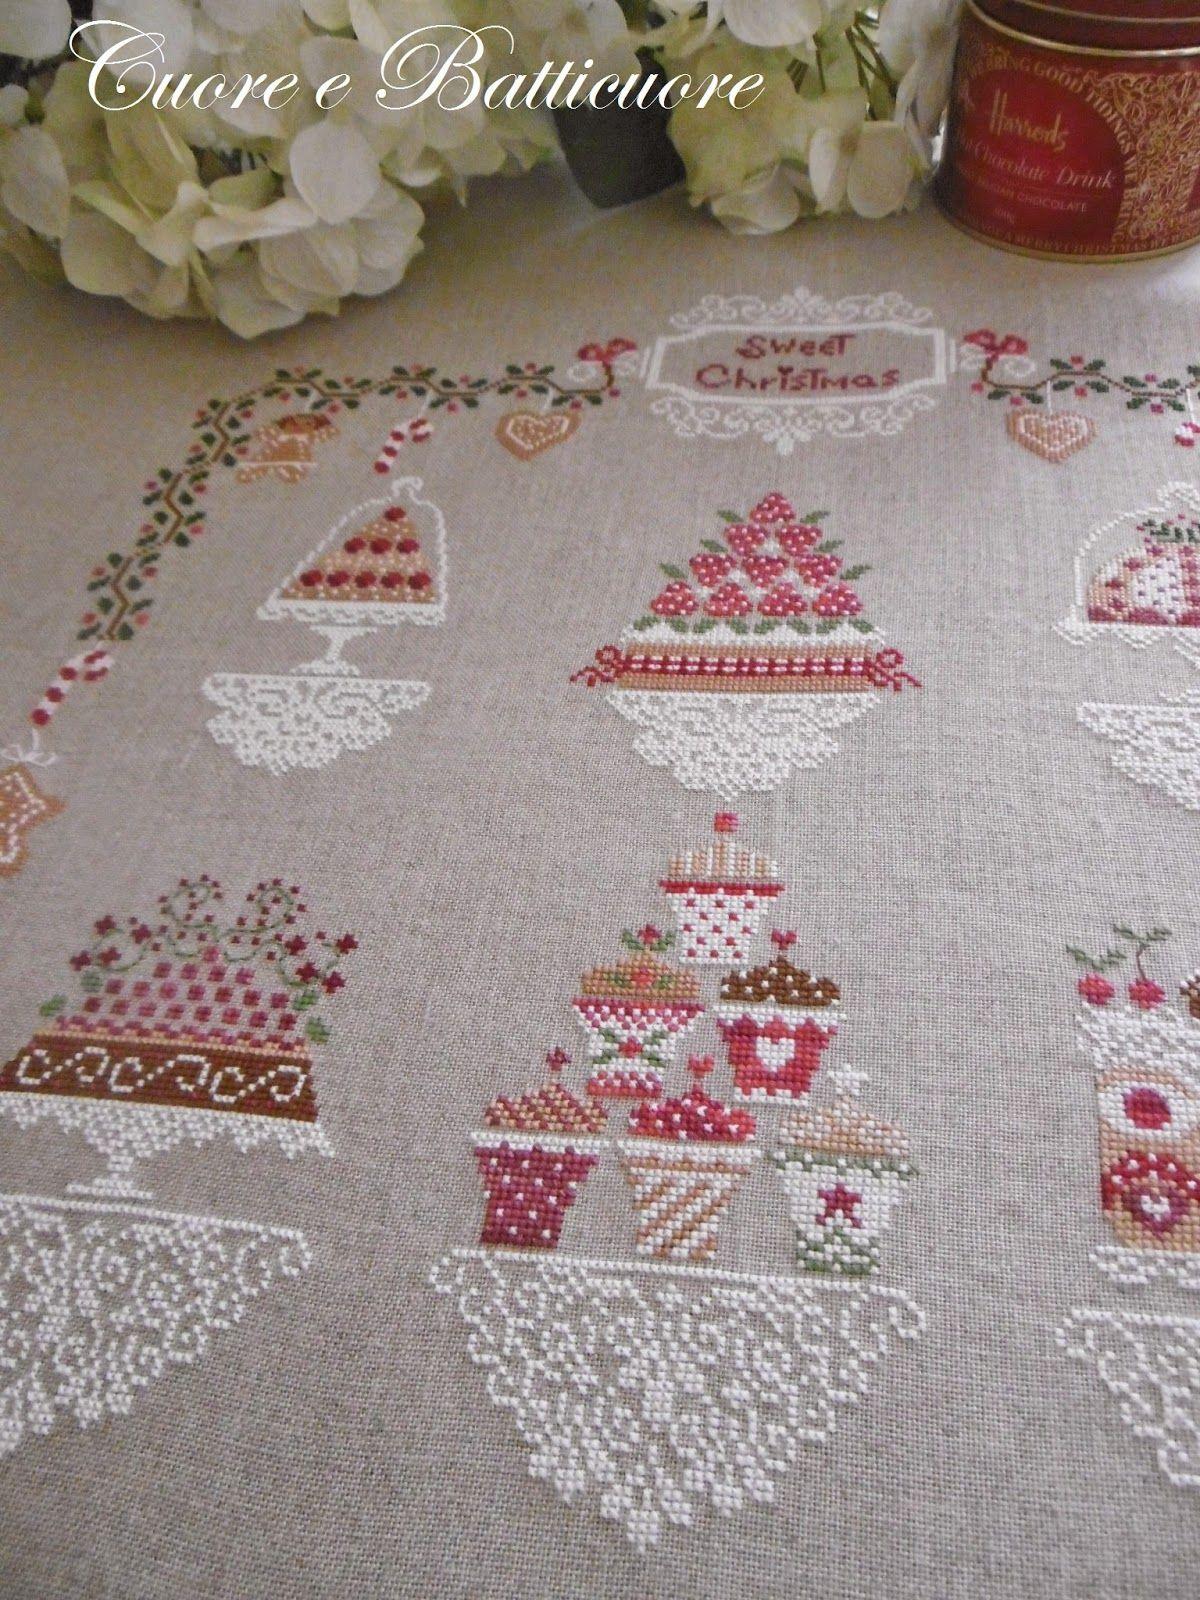 Pin de V Nuttall en Embroidery and Needlework   Pinterest   Punto de ...